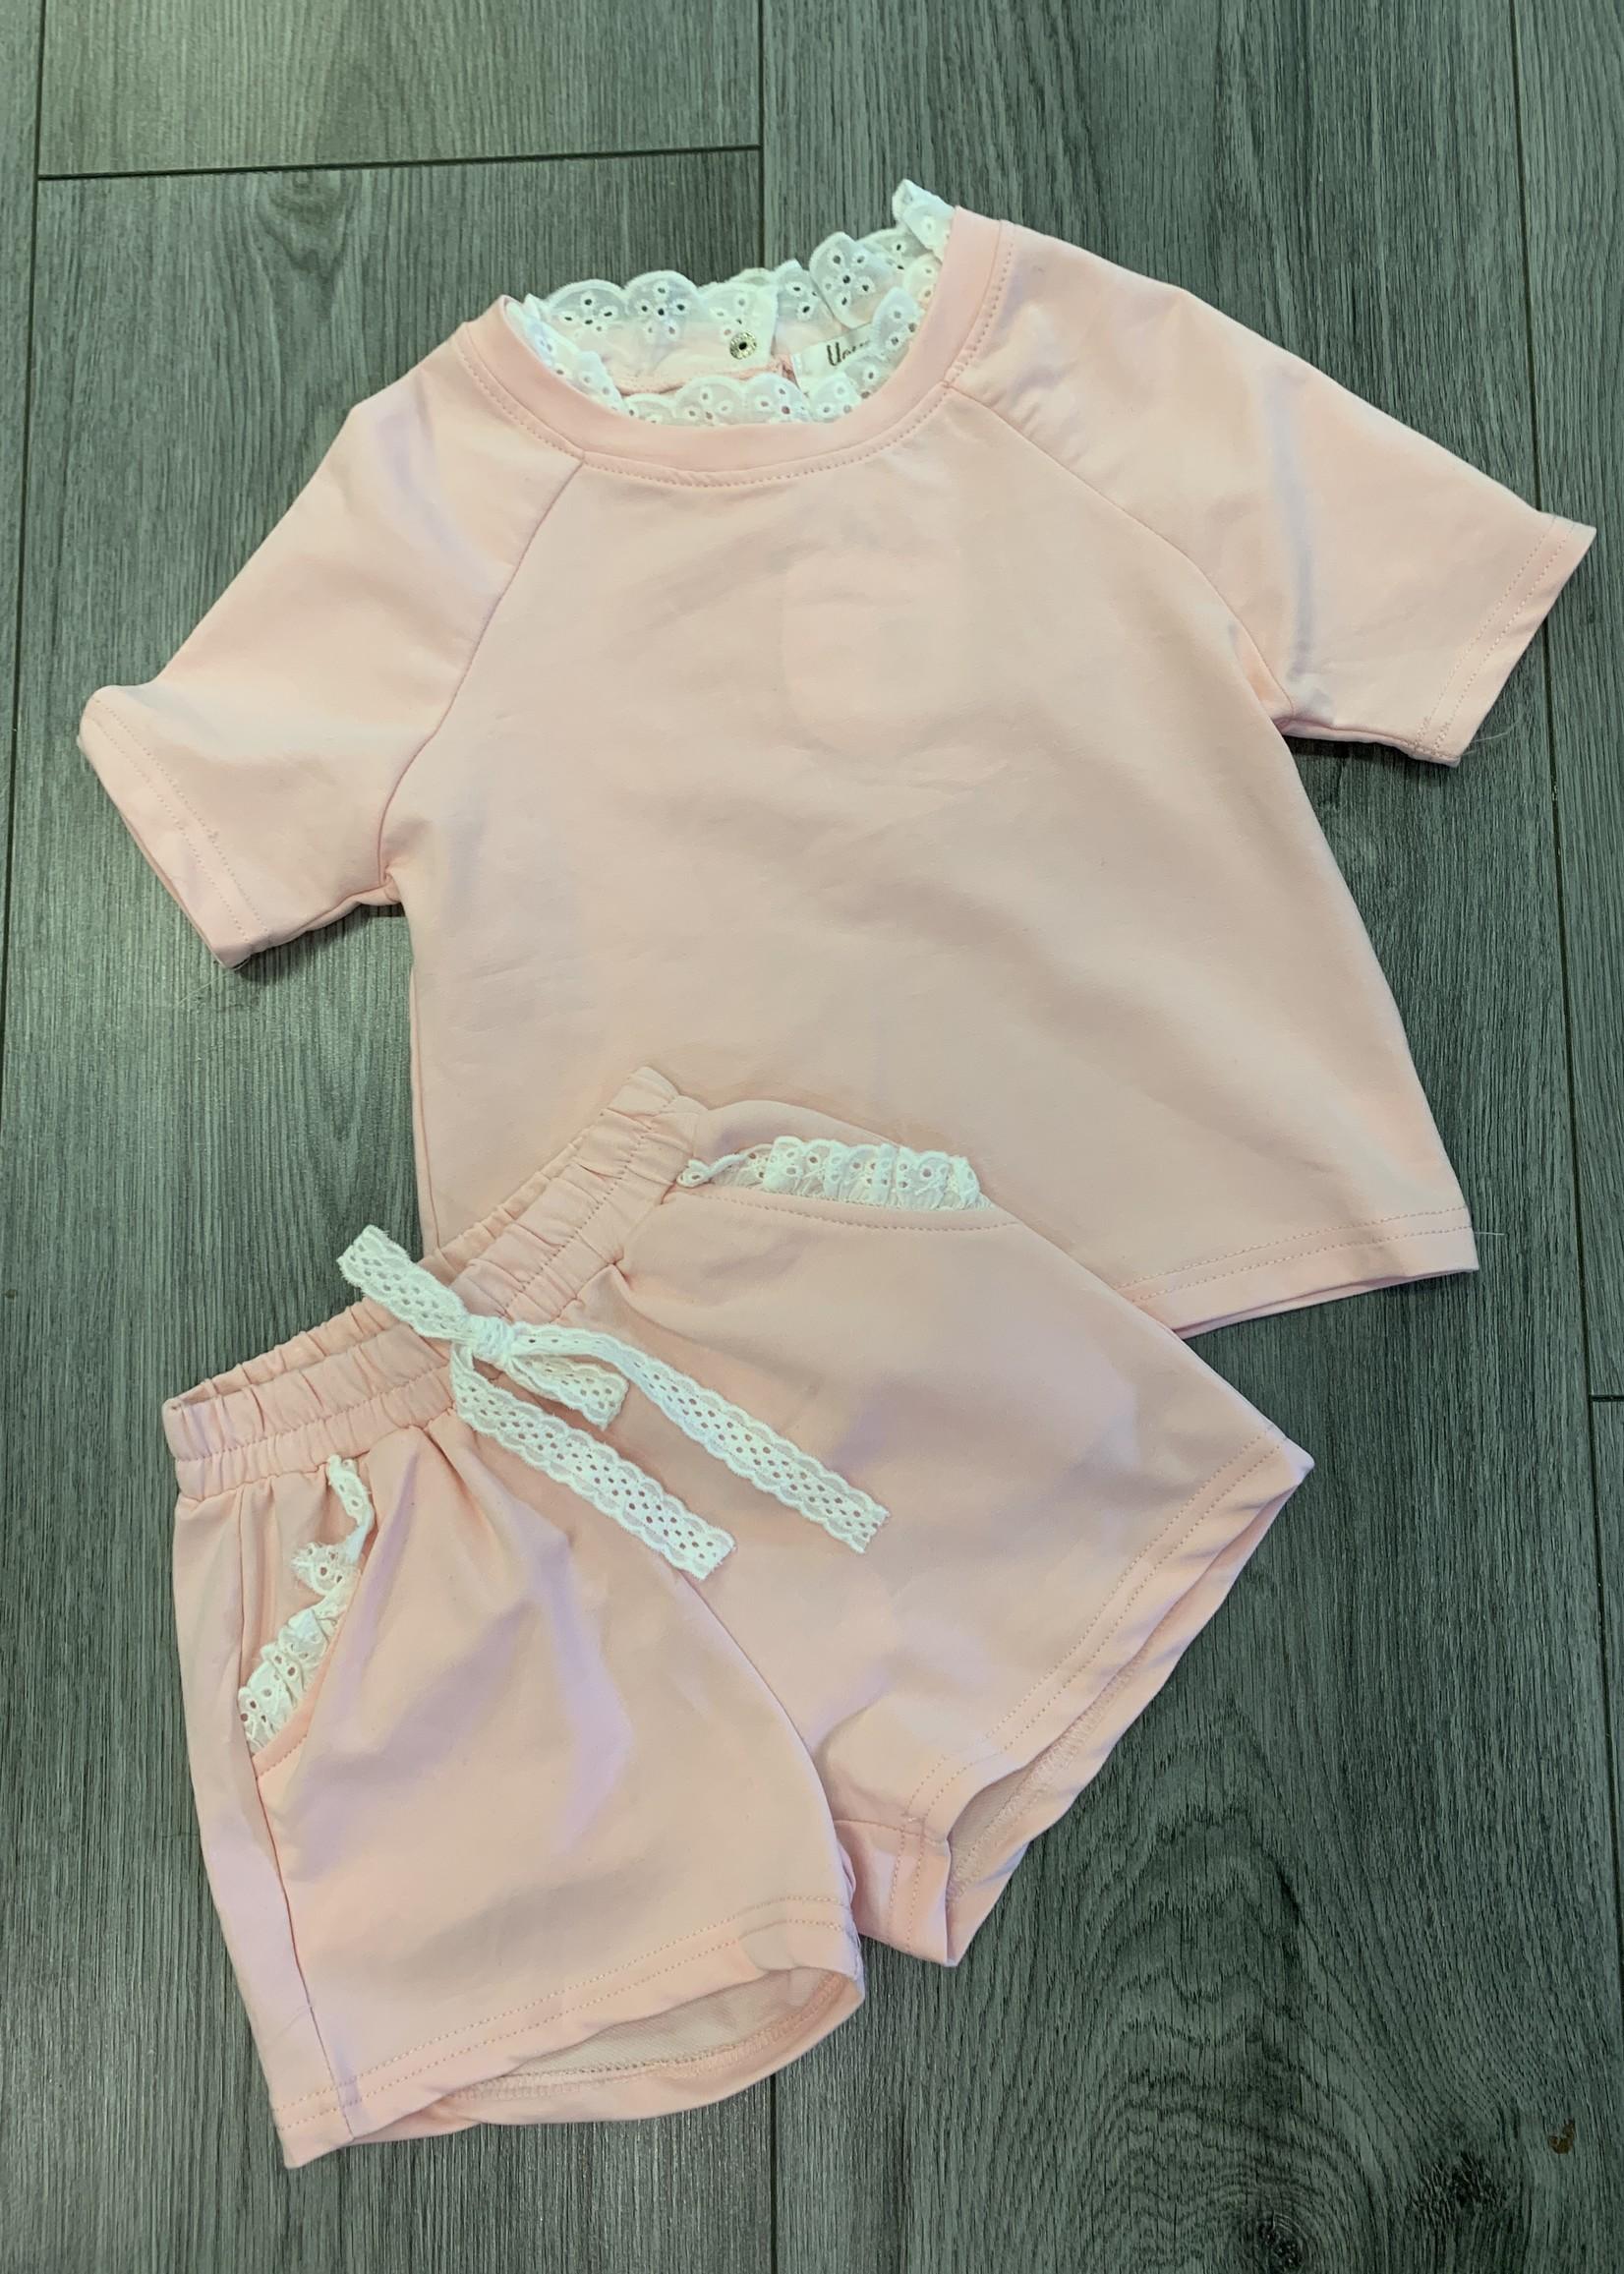 Divanis Divanis cute set pink